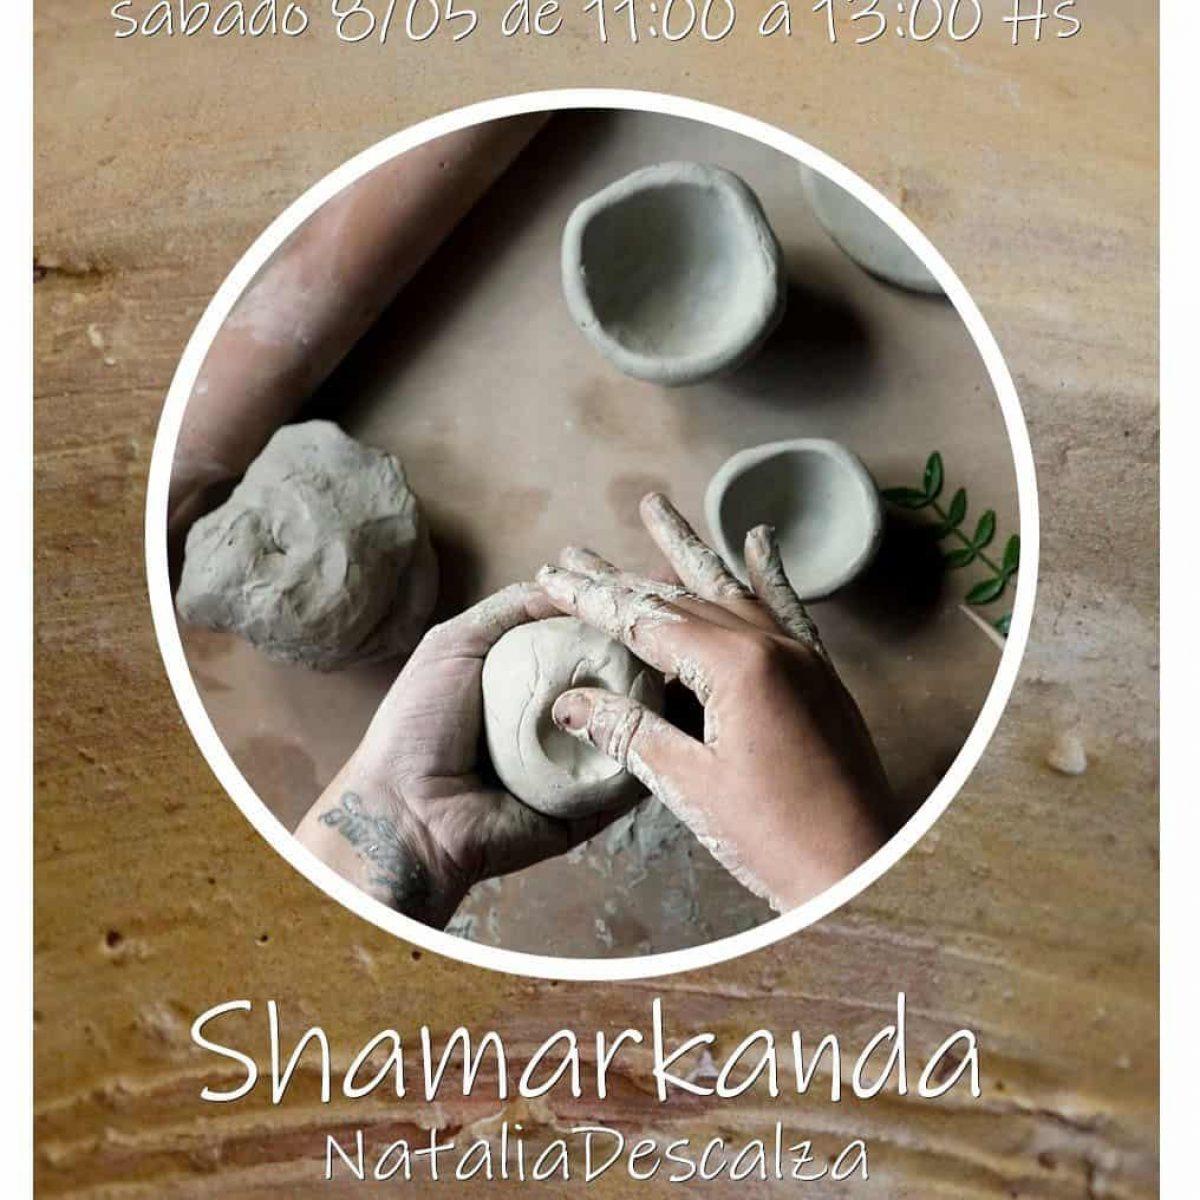 taller-ceràmica-shamarkanda-Eivissa-2021-welcometoibiza